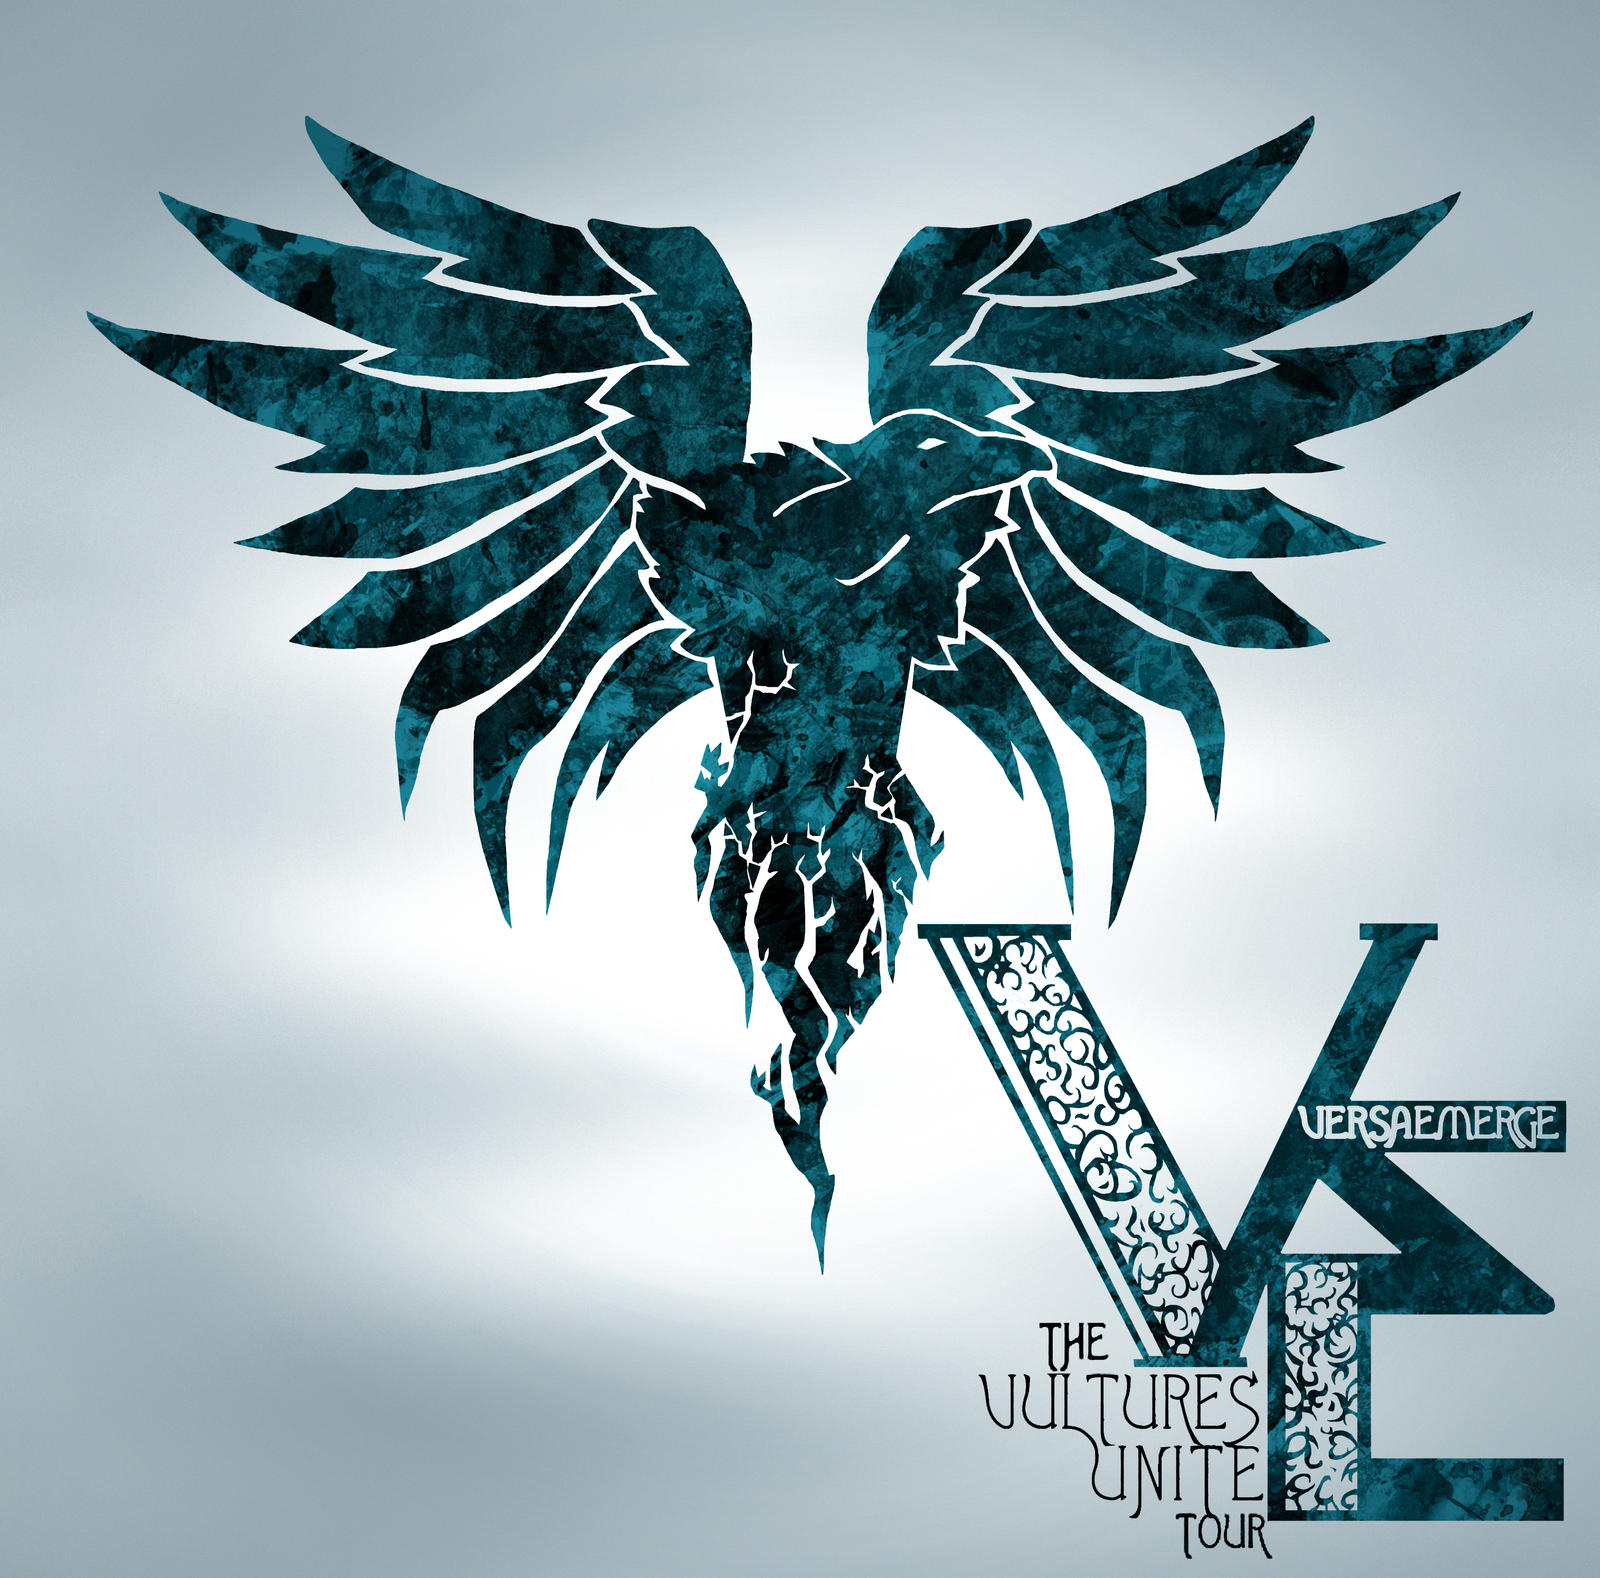 VERSAEMERGE CD COVER DESIGN By FATALxFRAME On DeviantArt